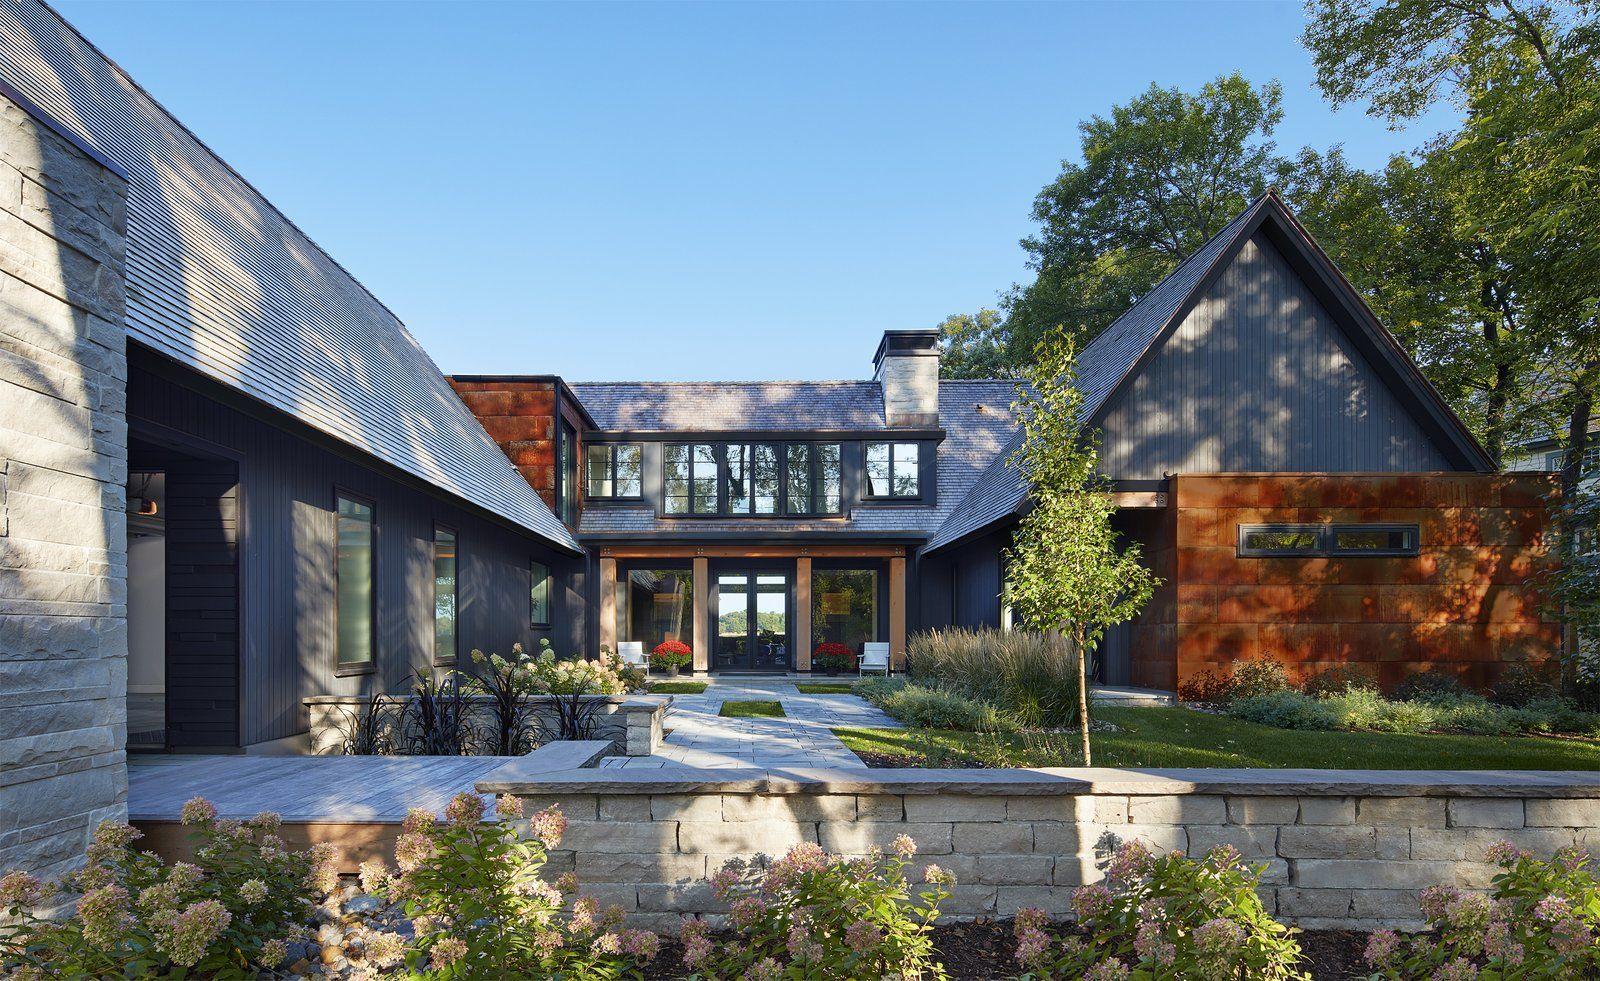 Modern Salt Box By Charlie Co Design House With Porch Modern Mediterranean Homes Pavilion Design